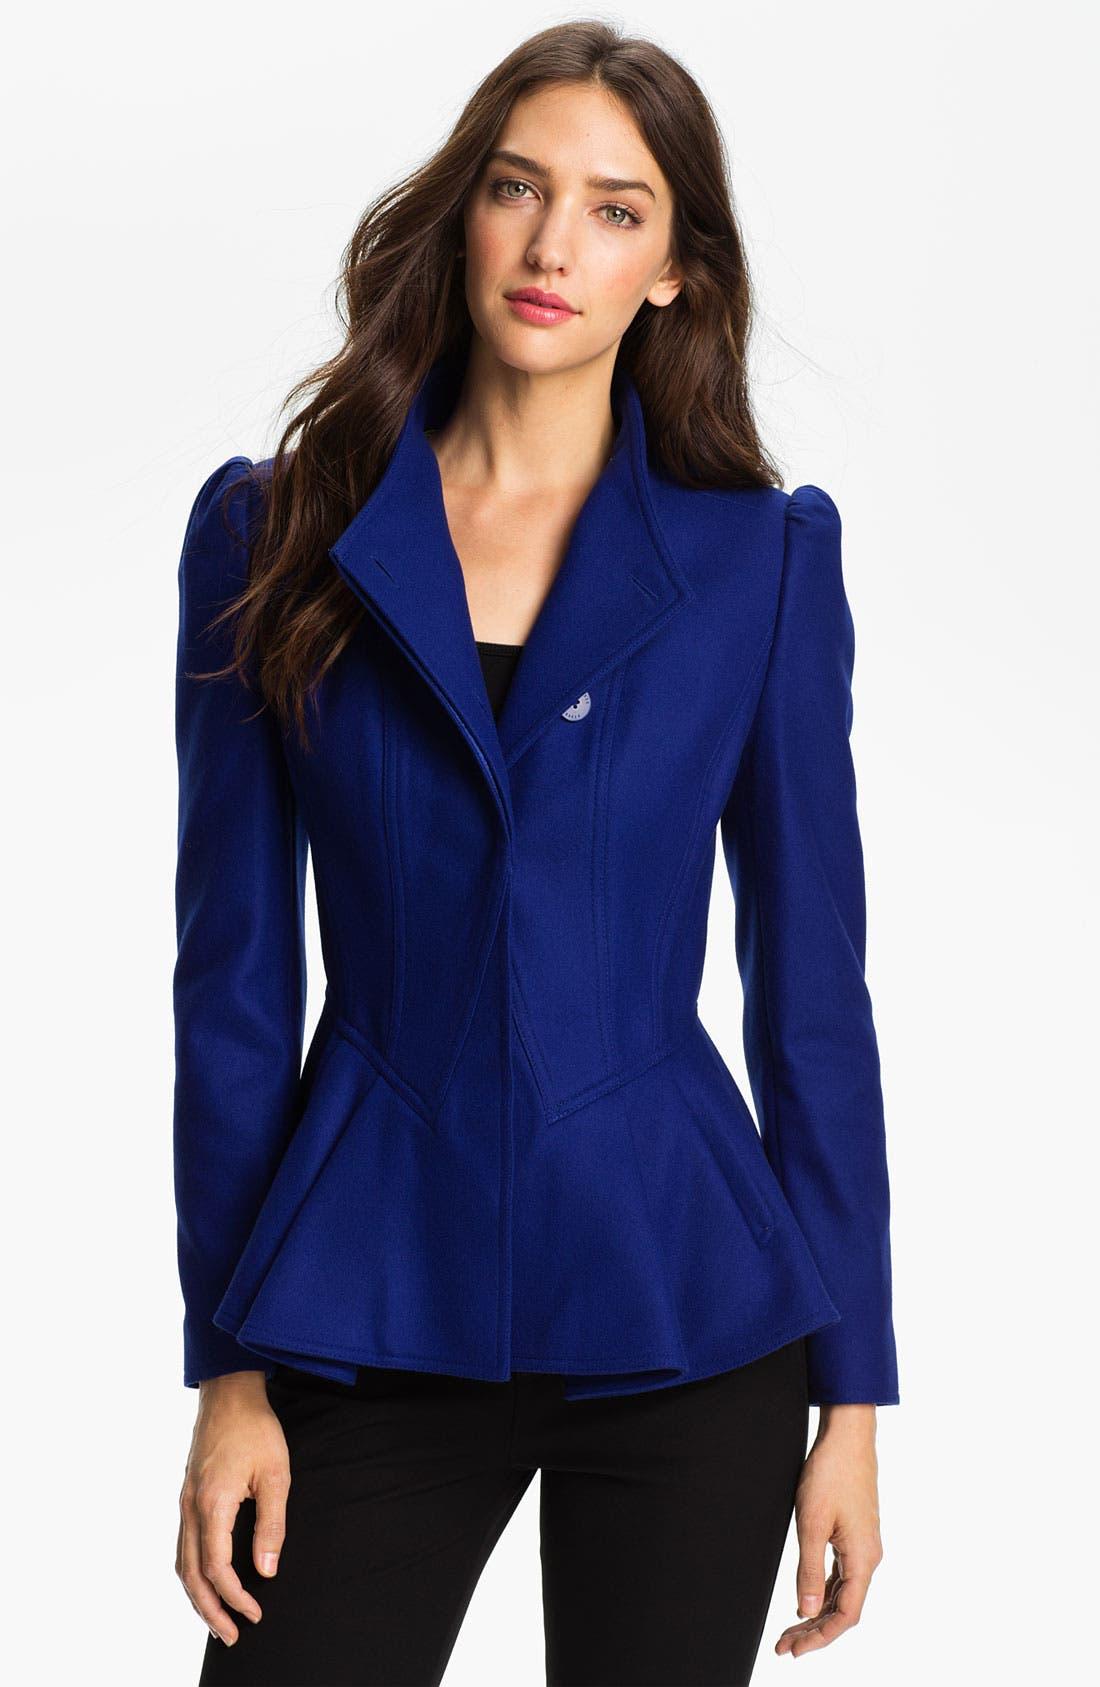 Alternate Image 1 Selected - Ted Baker London Peplum Wool Jacket